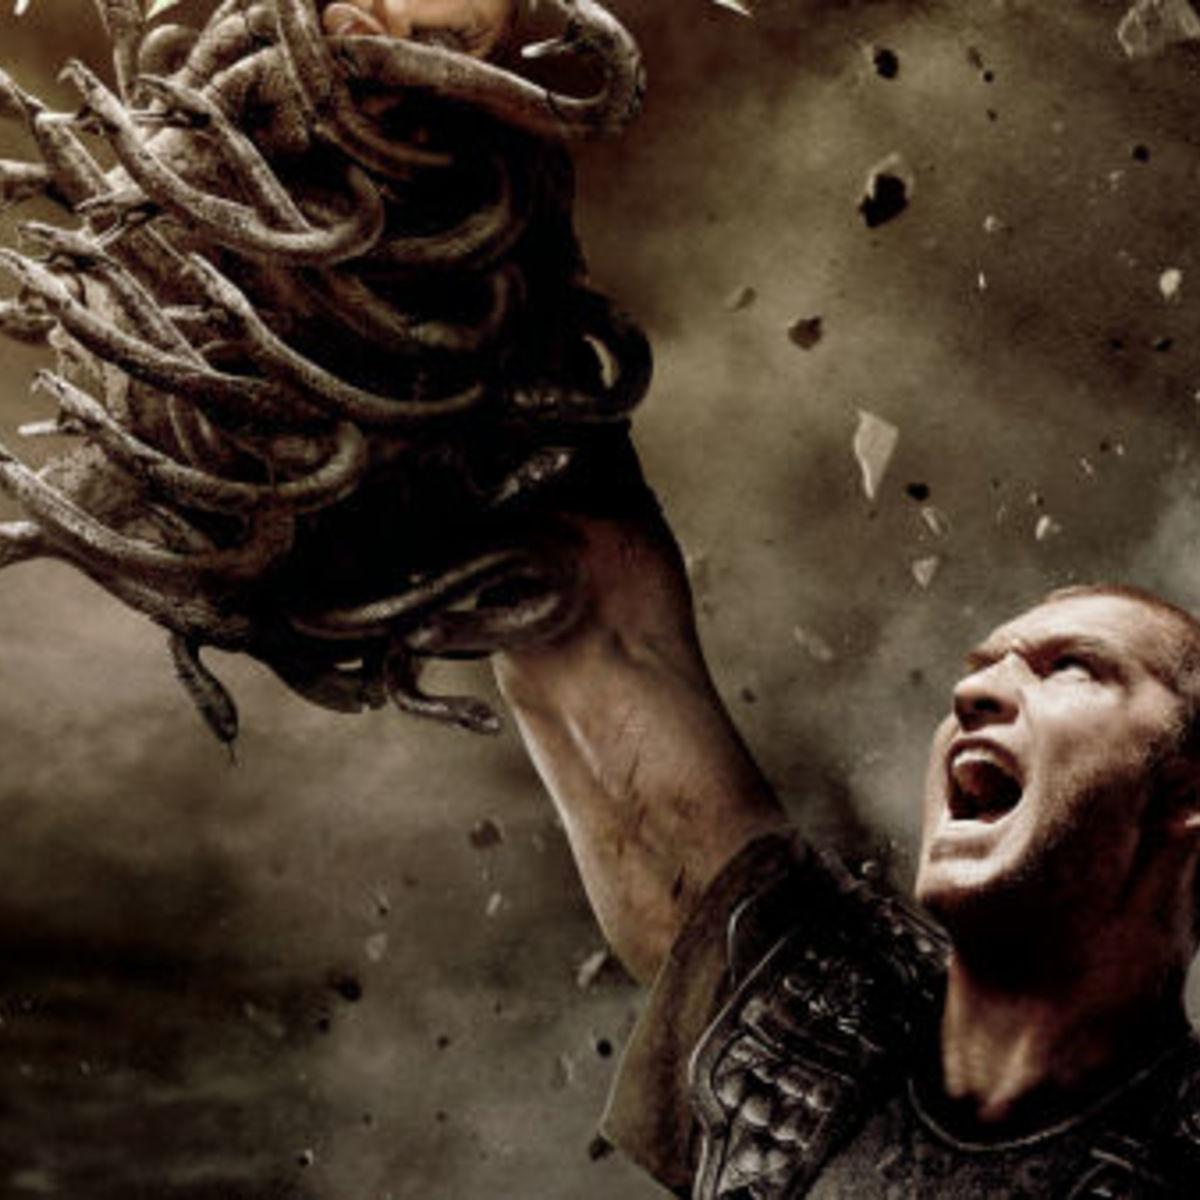 Clash_of_the_titans_Medusa_poster_thumb_1.jpg